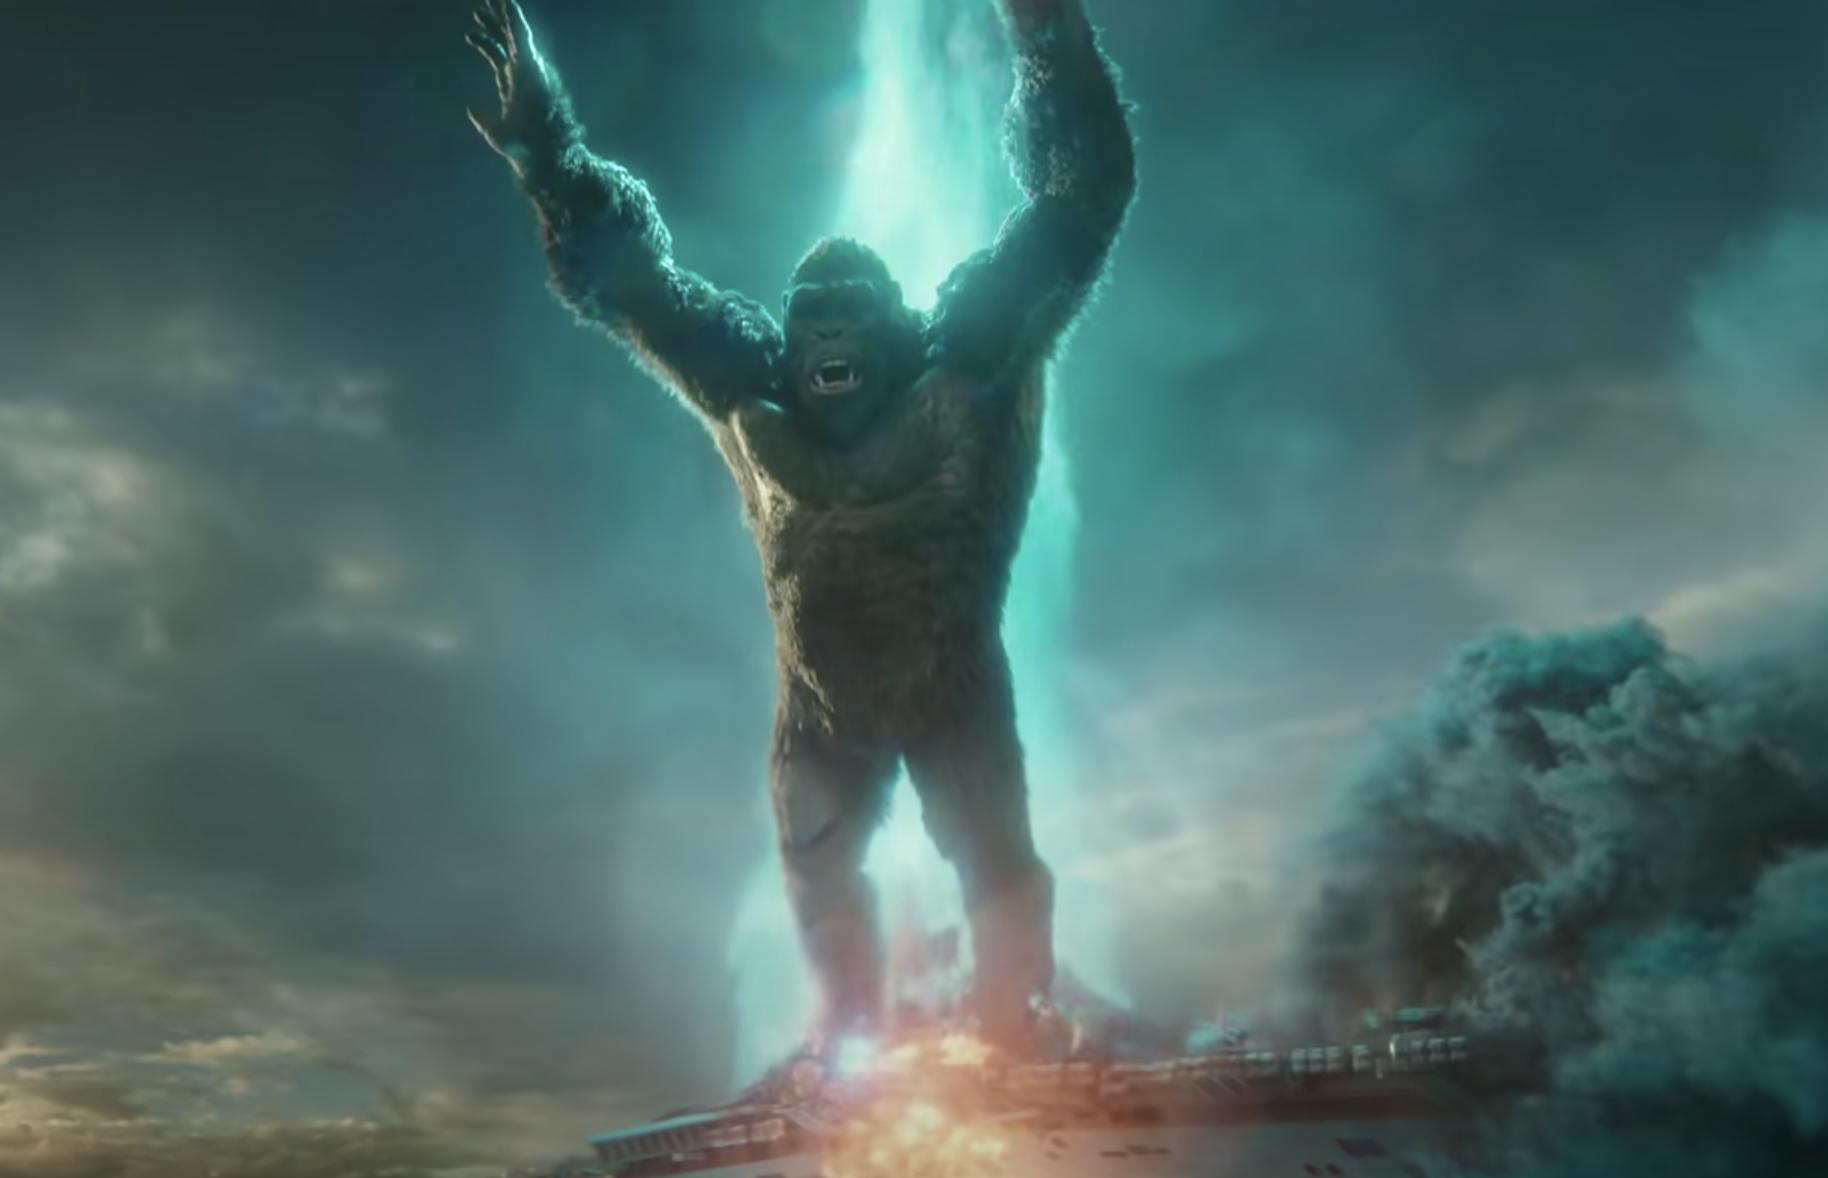 Godzilla vs Kong timeline explains why King Kong is now bigger